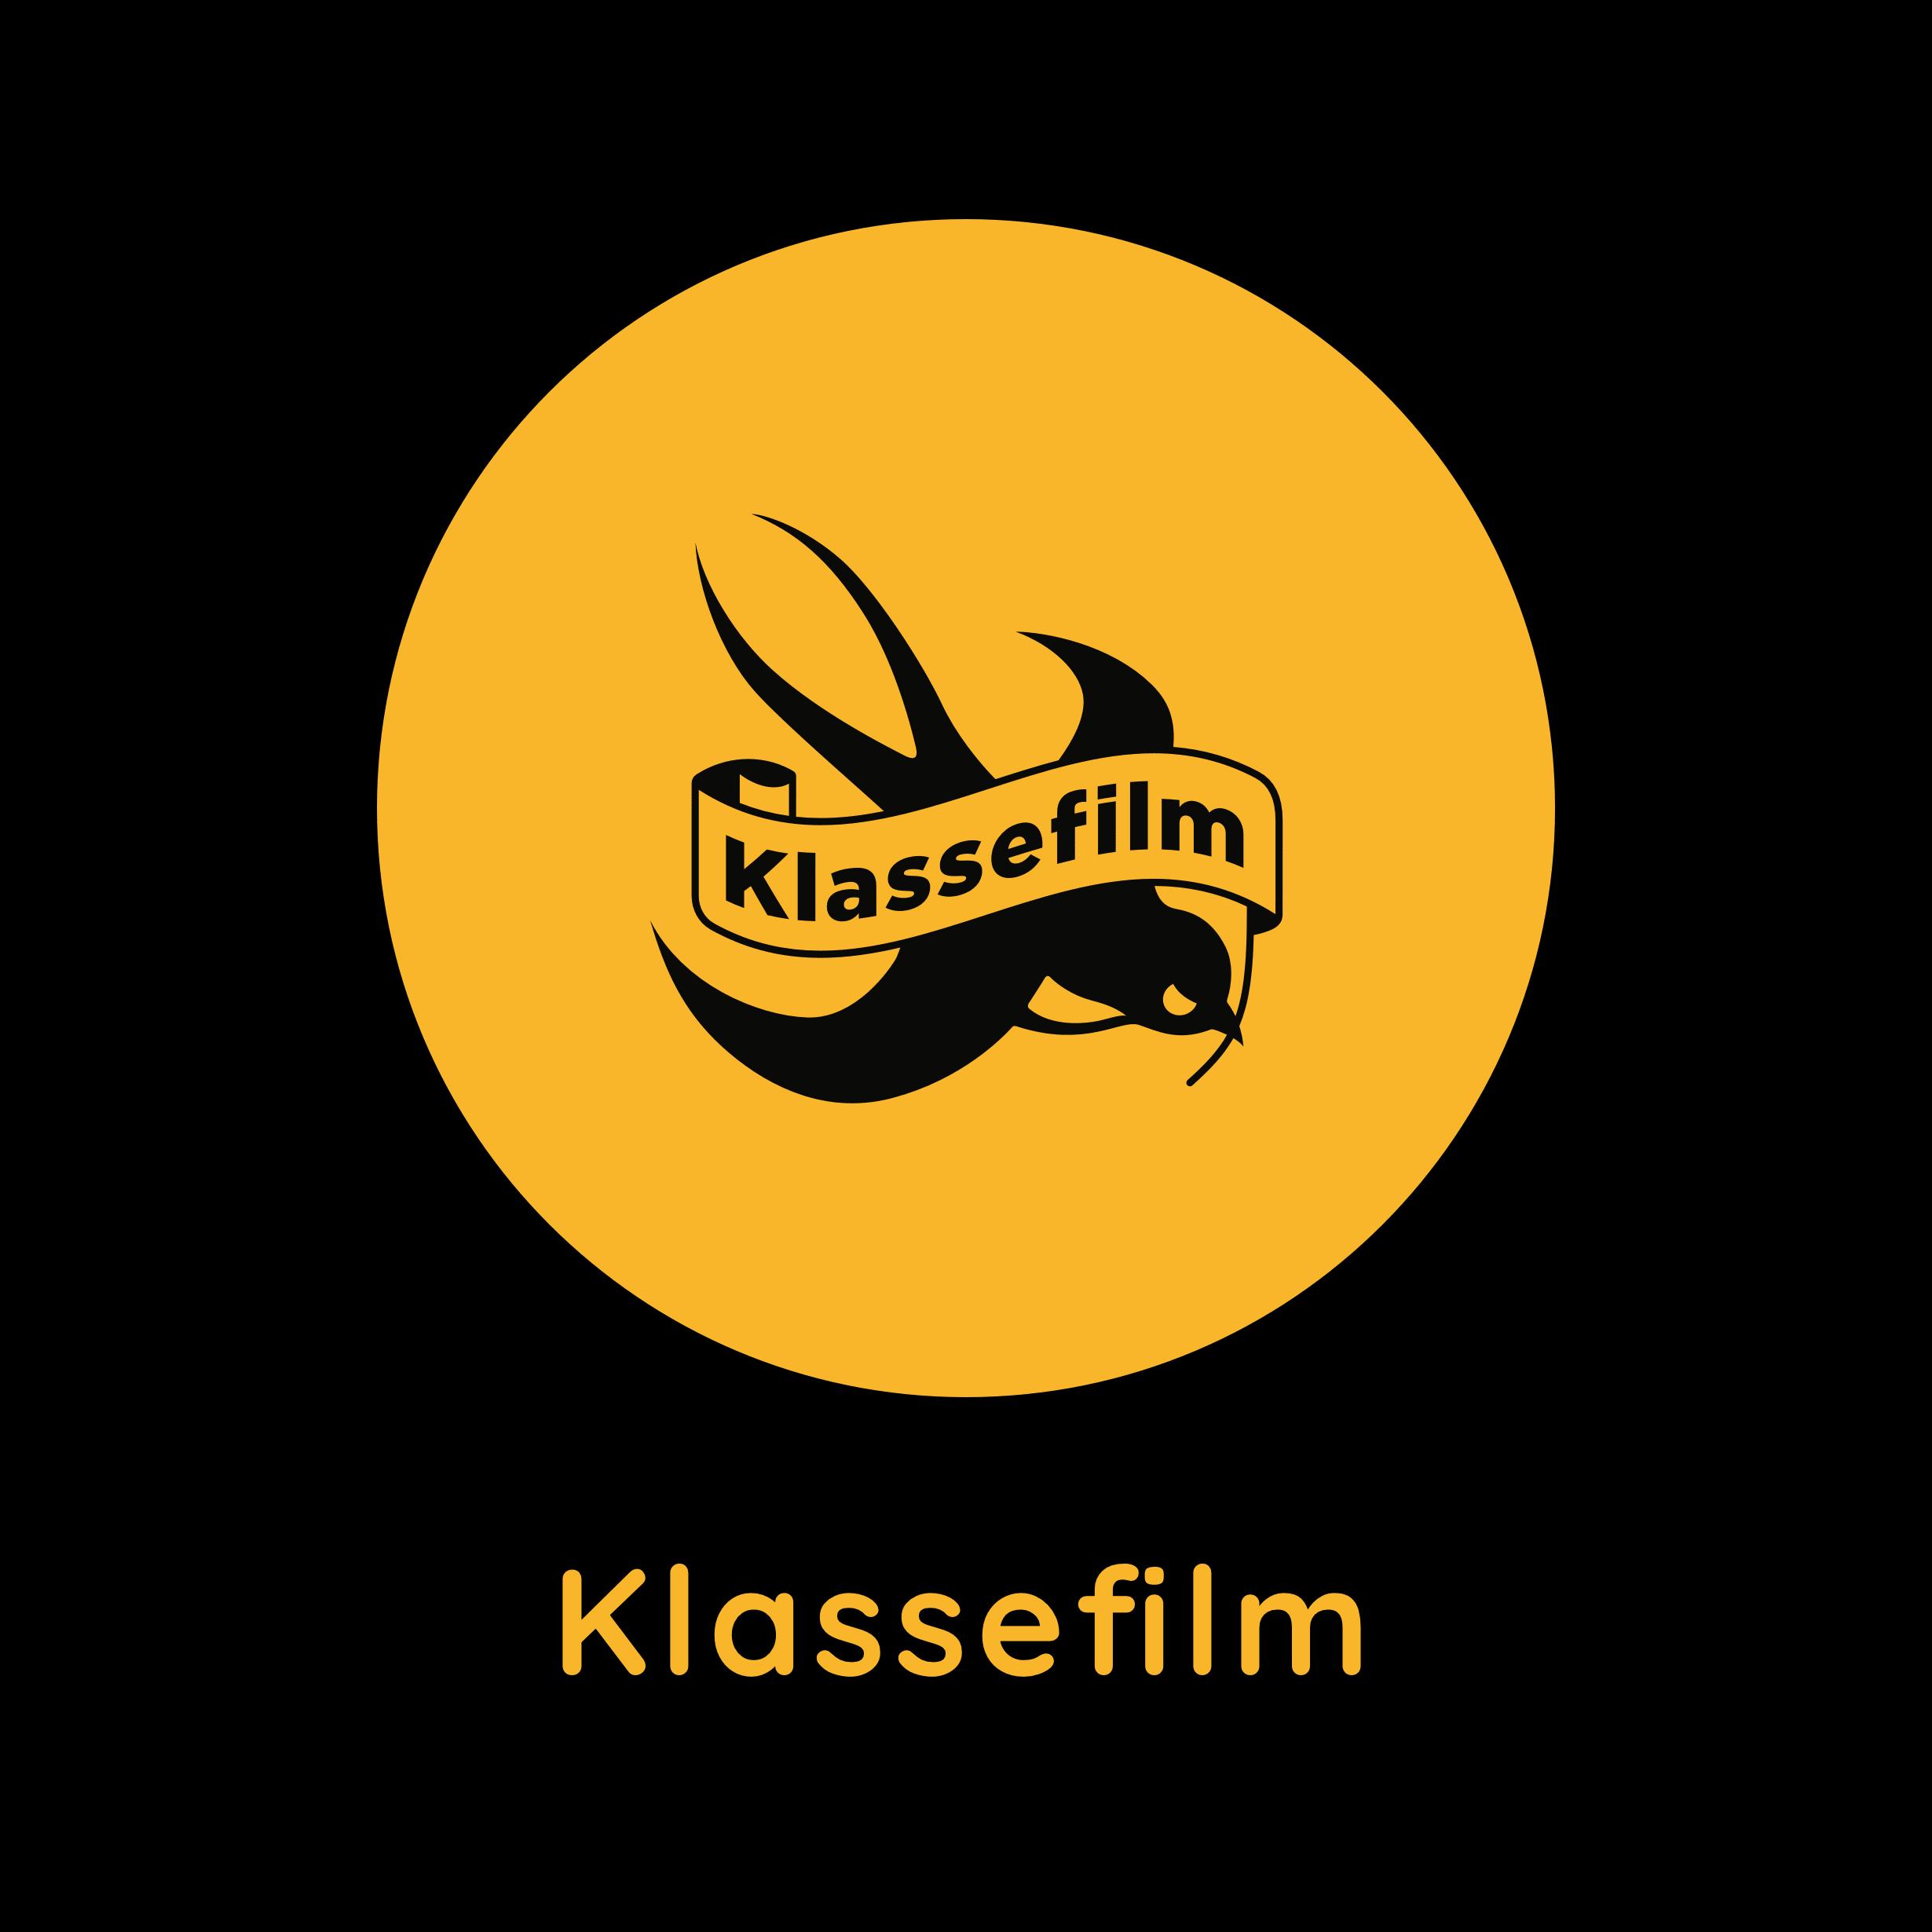 Klassefilm logo